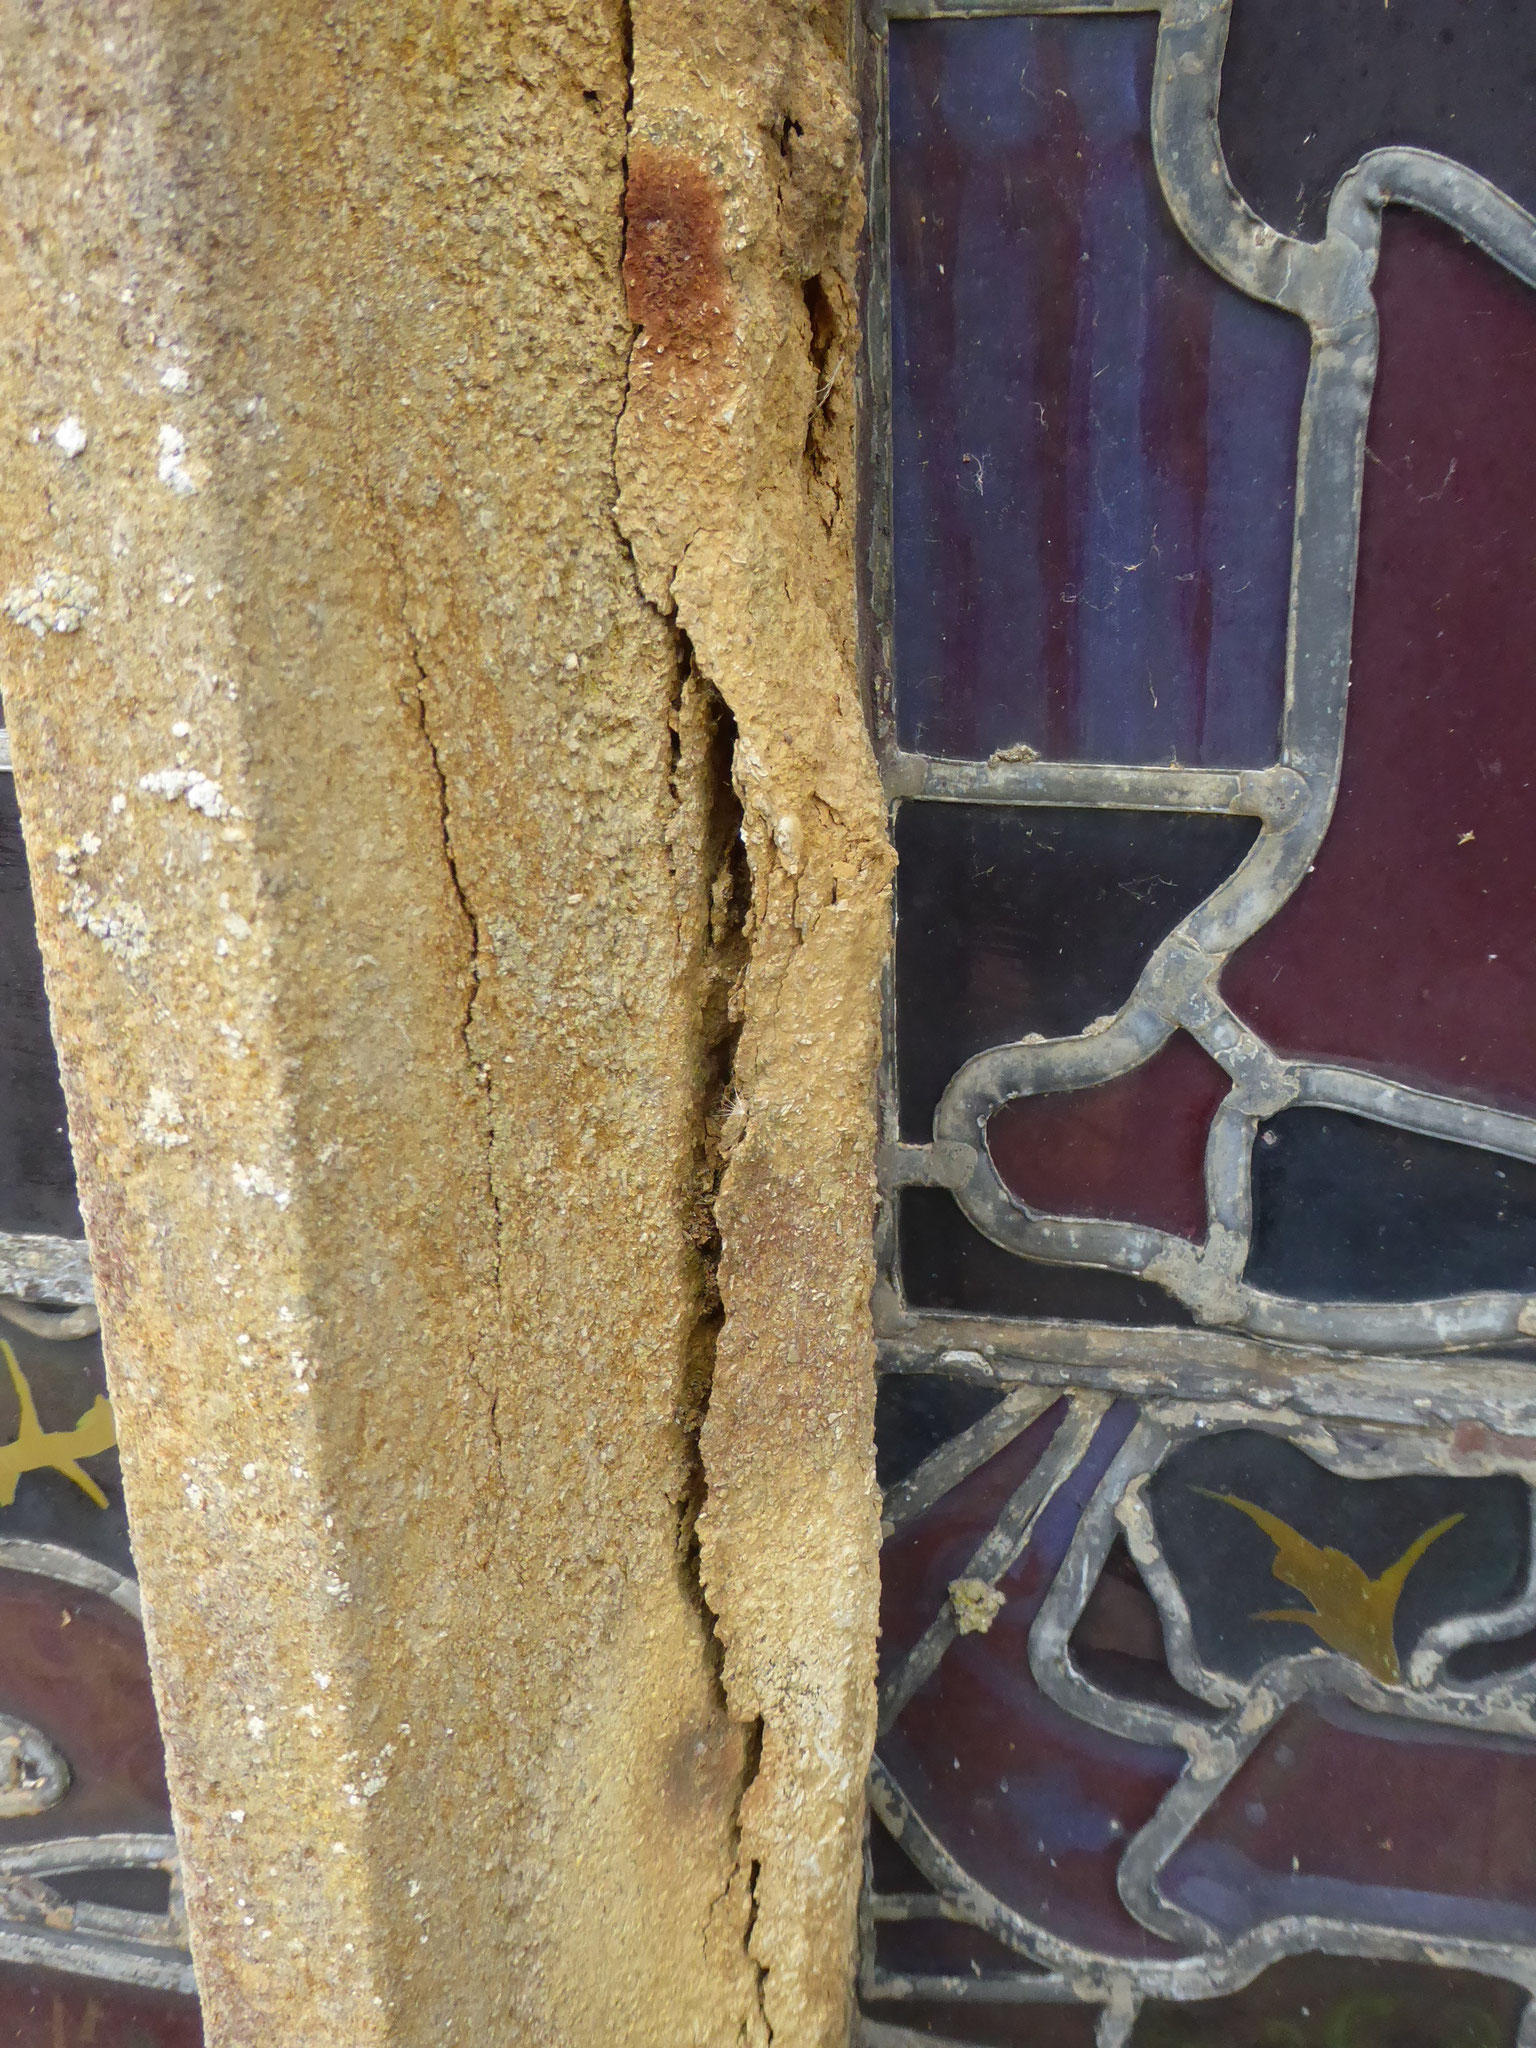 Corroding stonework